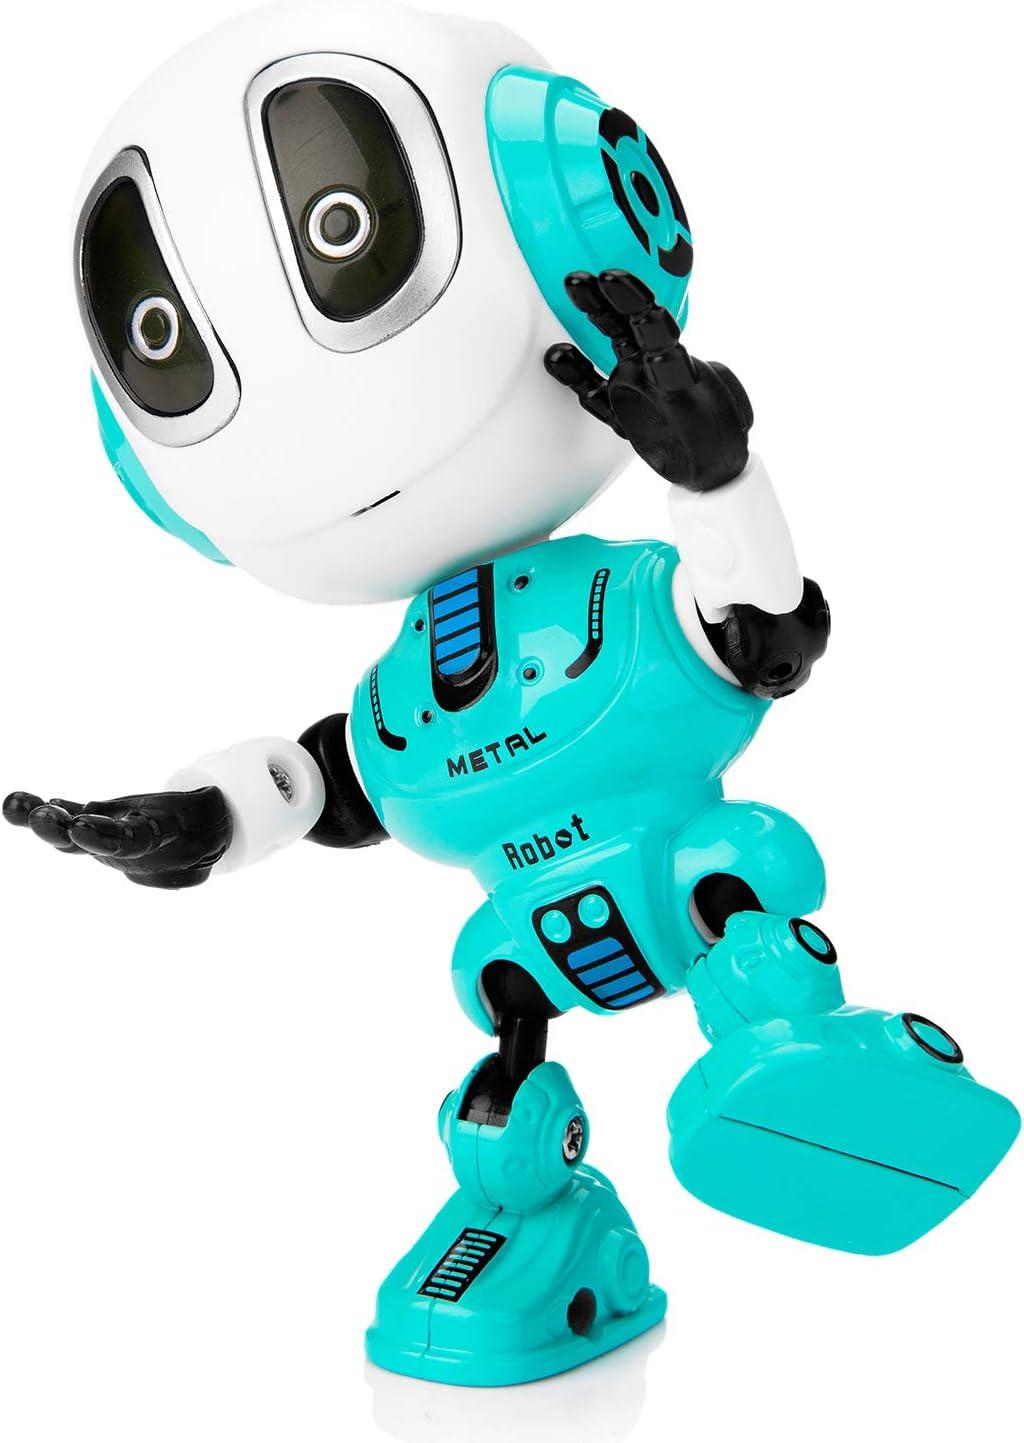 TDORA Talking Robot Toys for Kids,Educational Smart Learning Stem Toys Cool Sounds Touch Sensor LED Light Robot Interactive Game Smart Toys for Kids